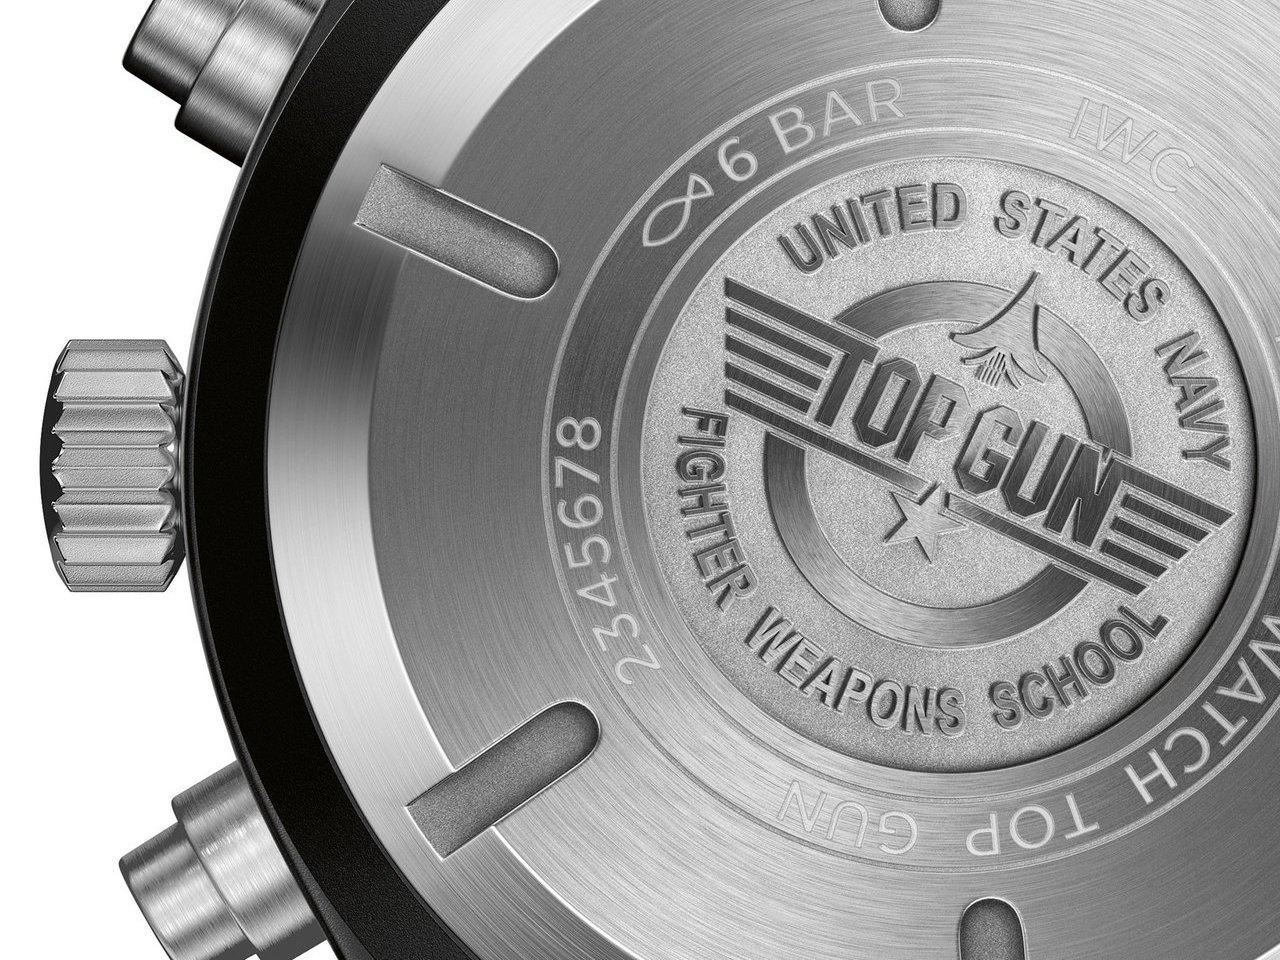 SIHH-2016-IWC Big-Pilot-Watch-Chronograph-TOP-GUN-ref-IW389001-0-100_4